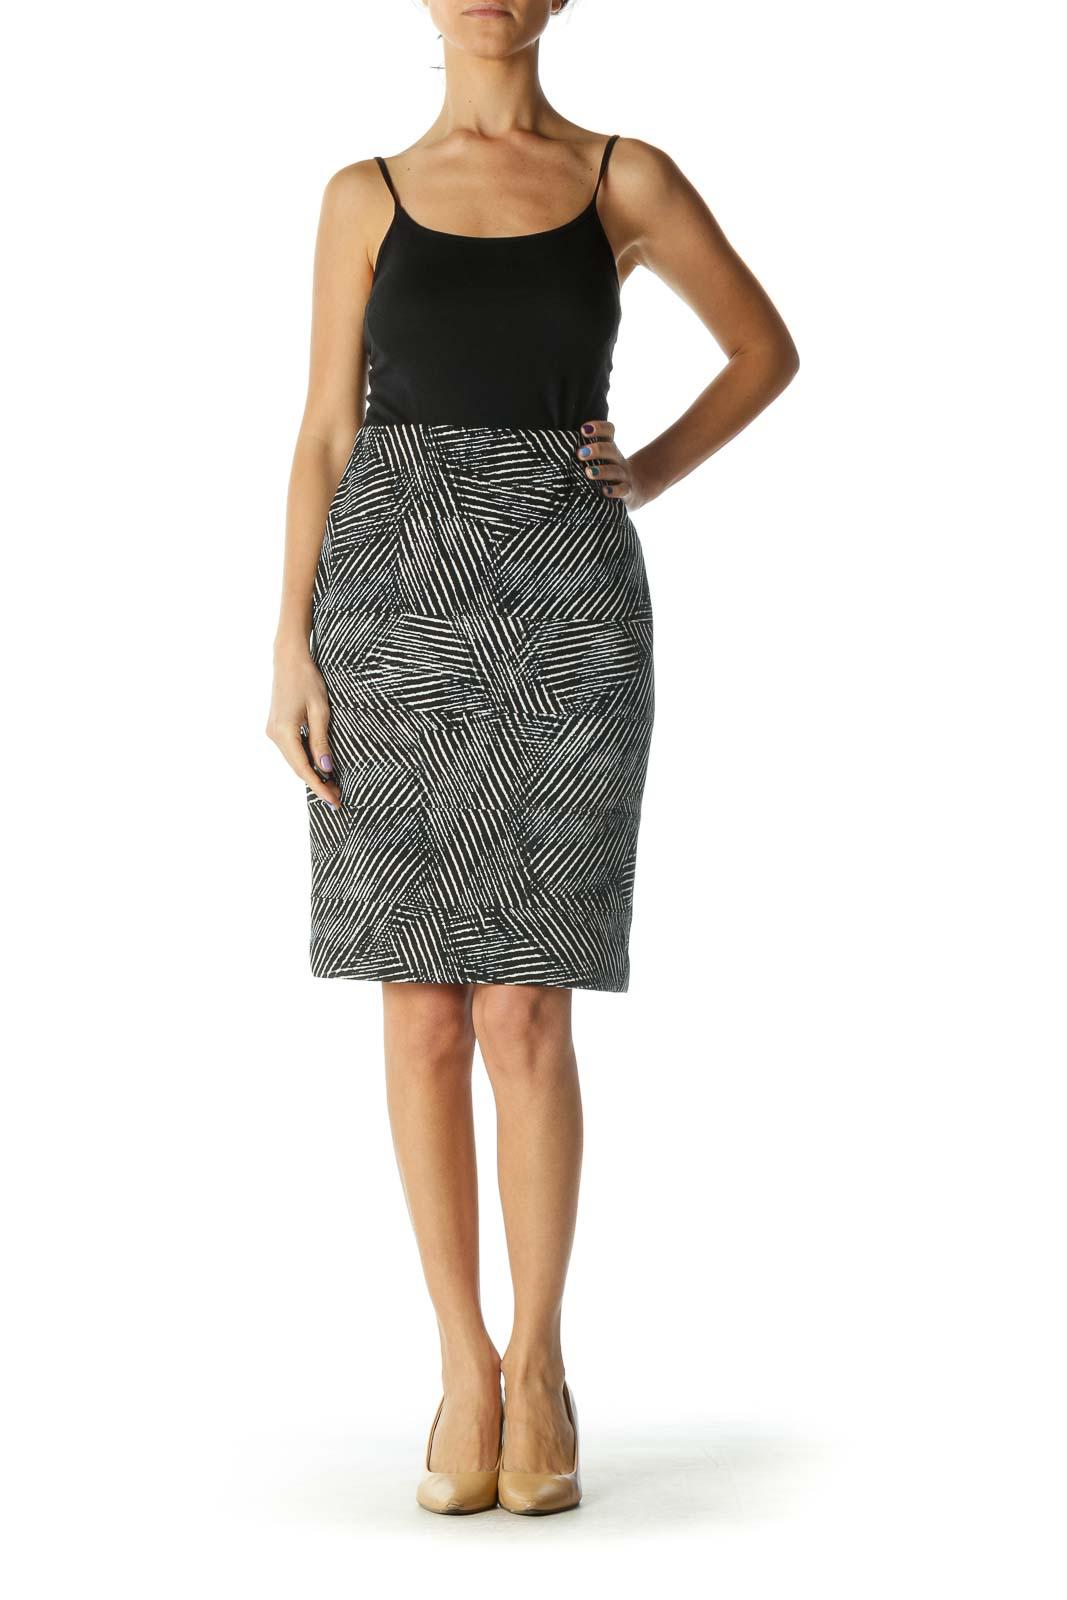 Black and White Zebra Print Bandage Wrap Pencil Skirt